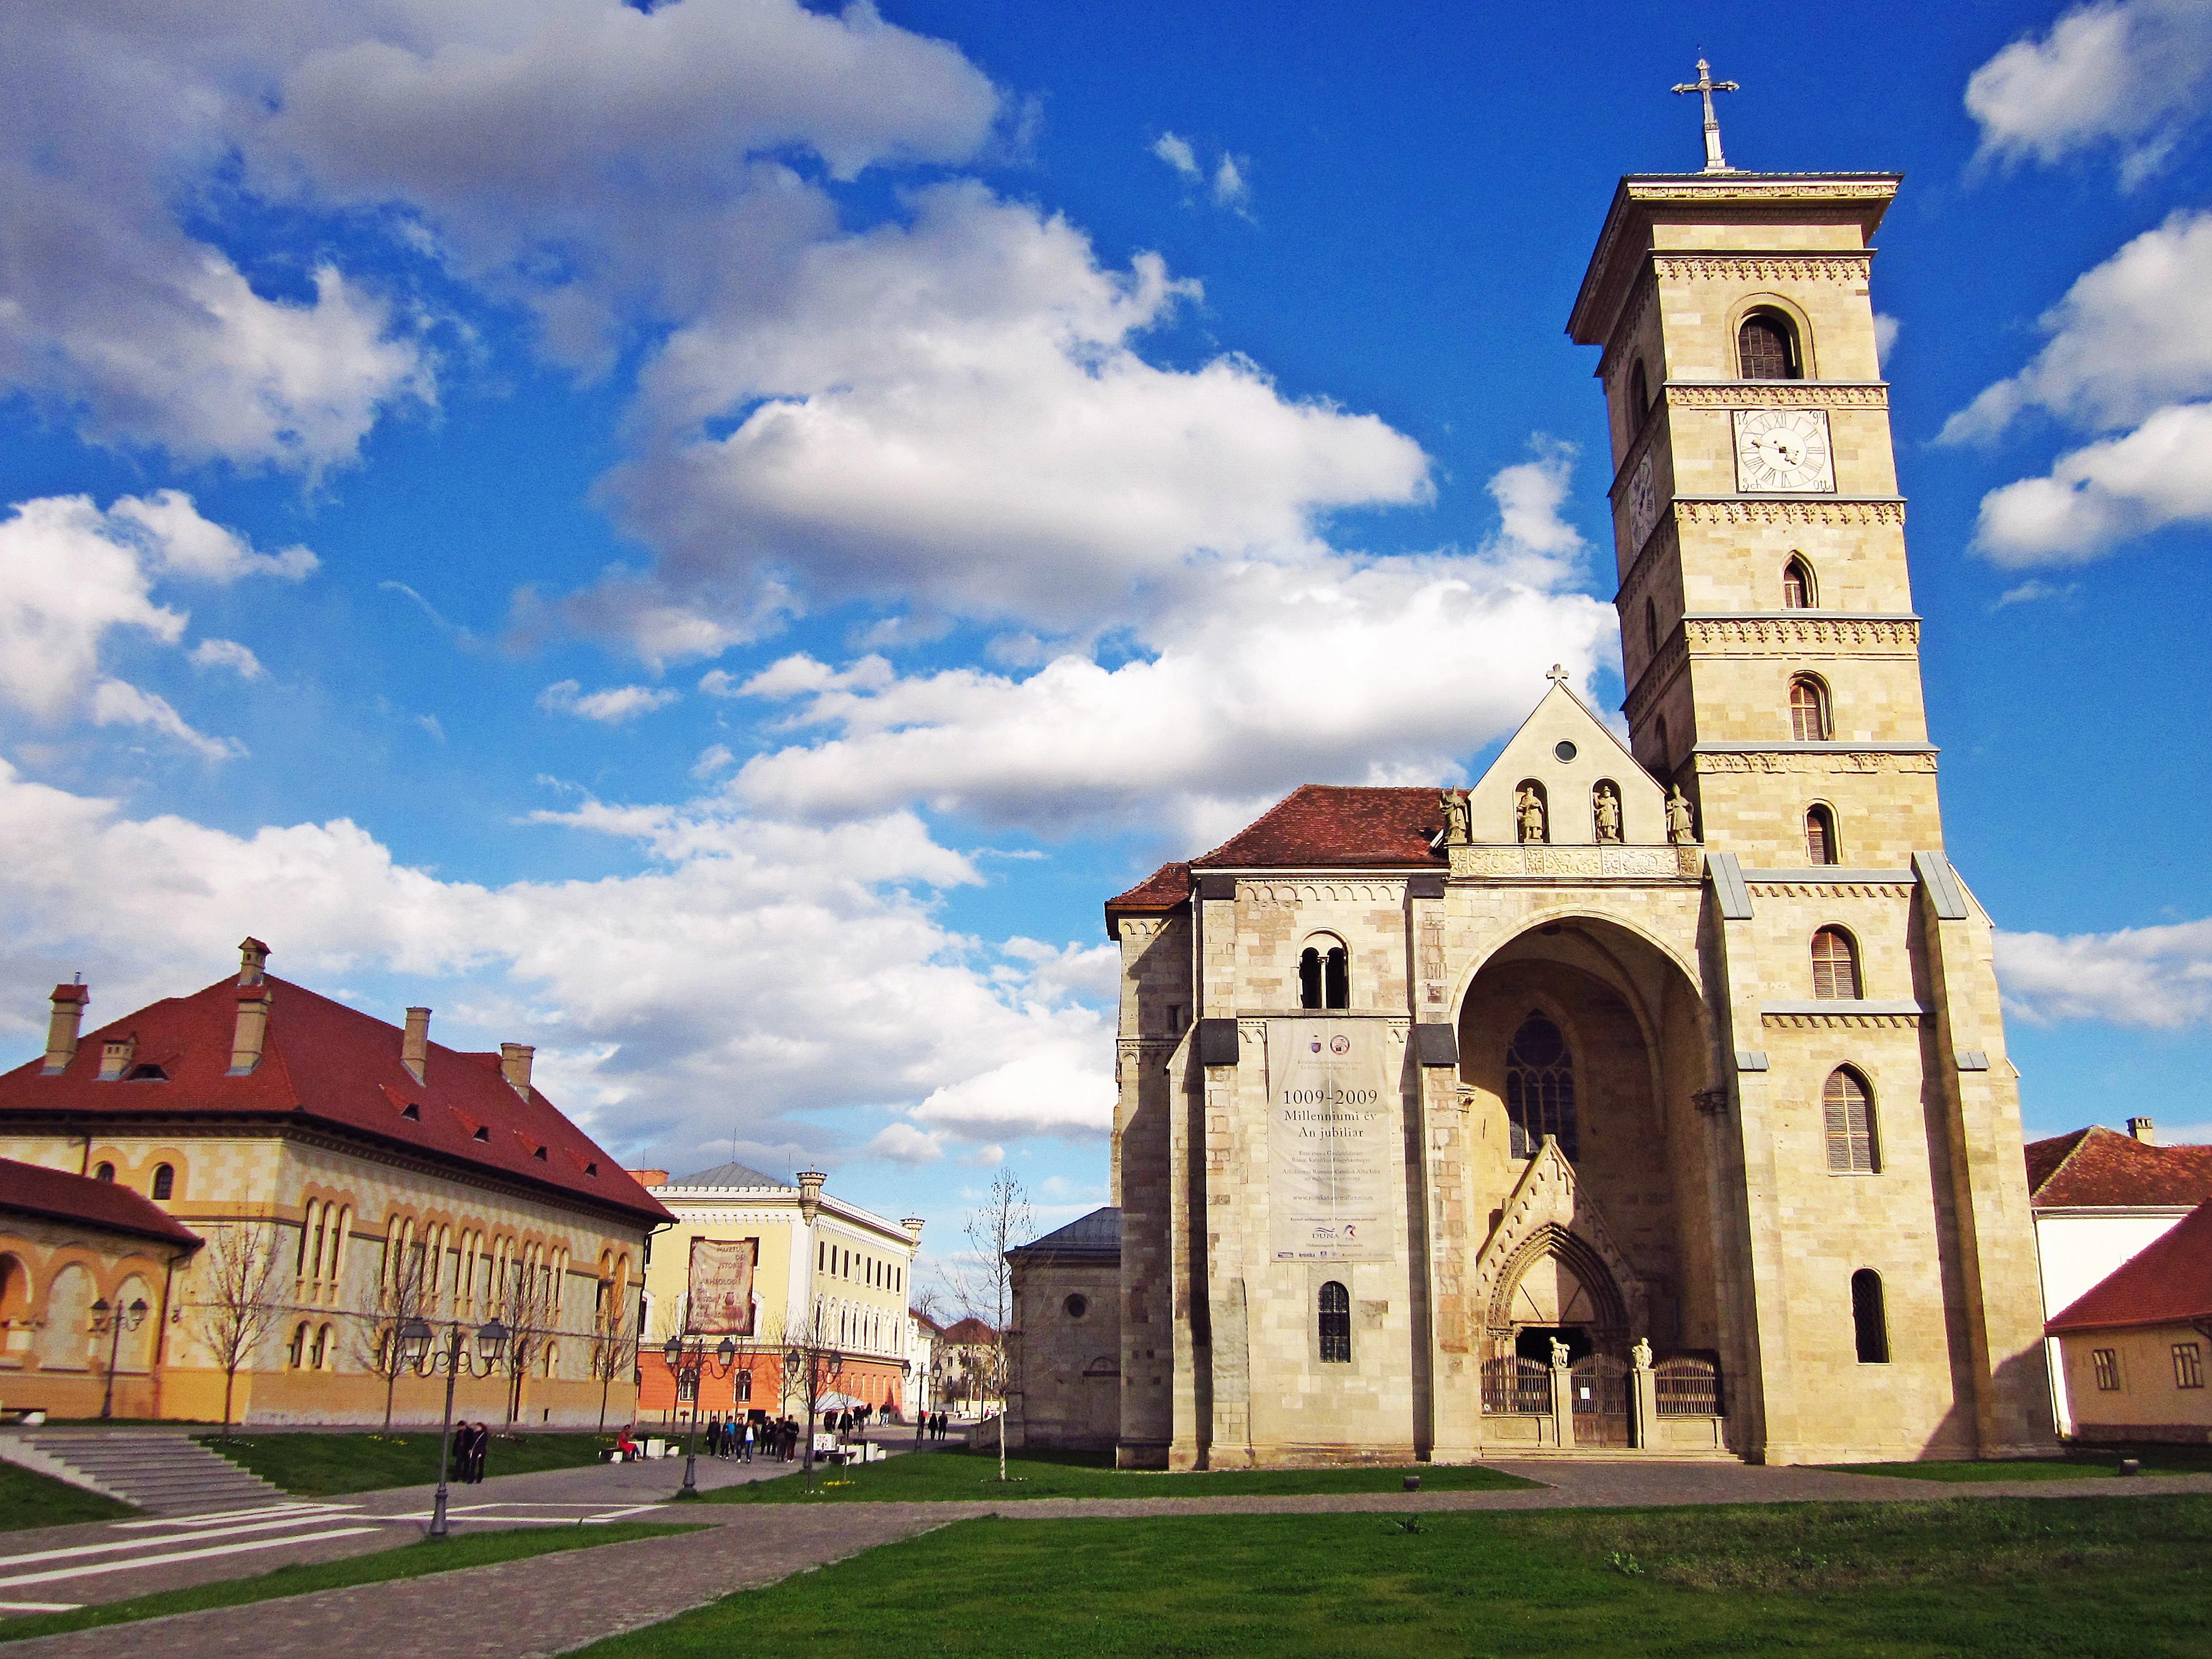 St. Michael Kathedrale